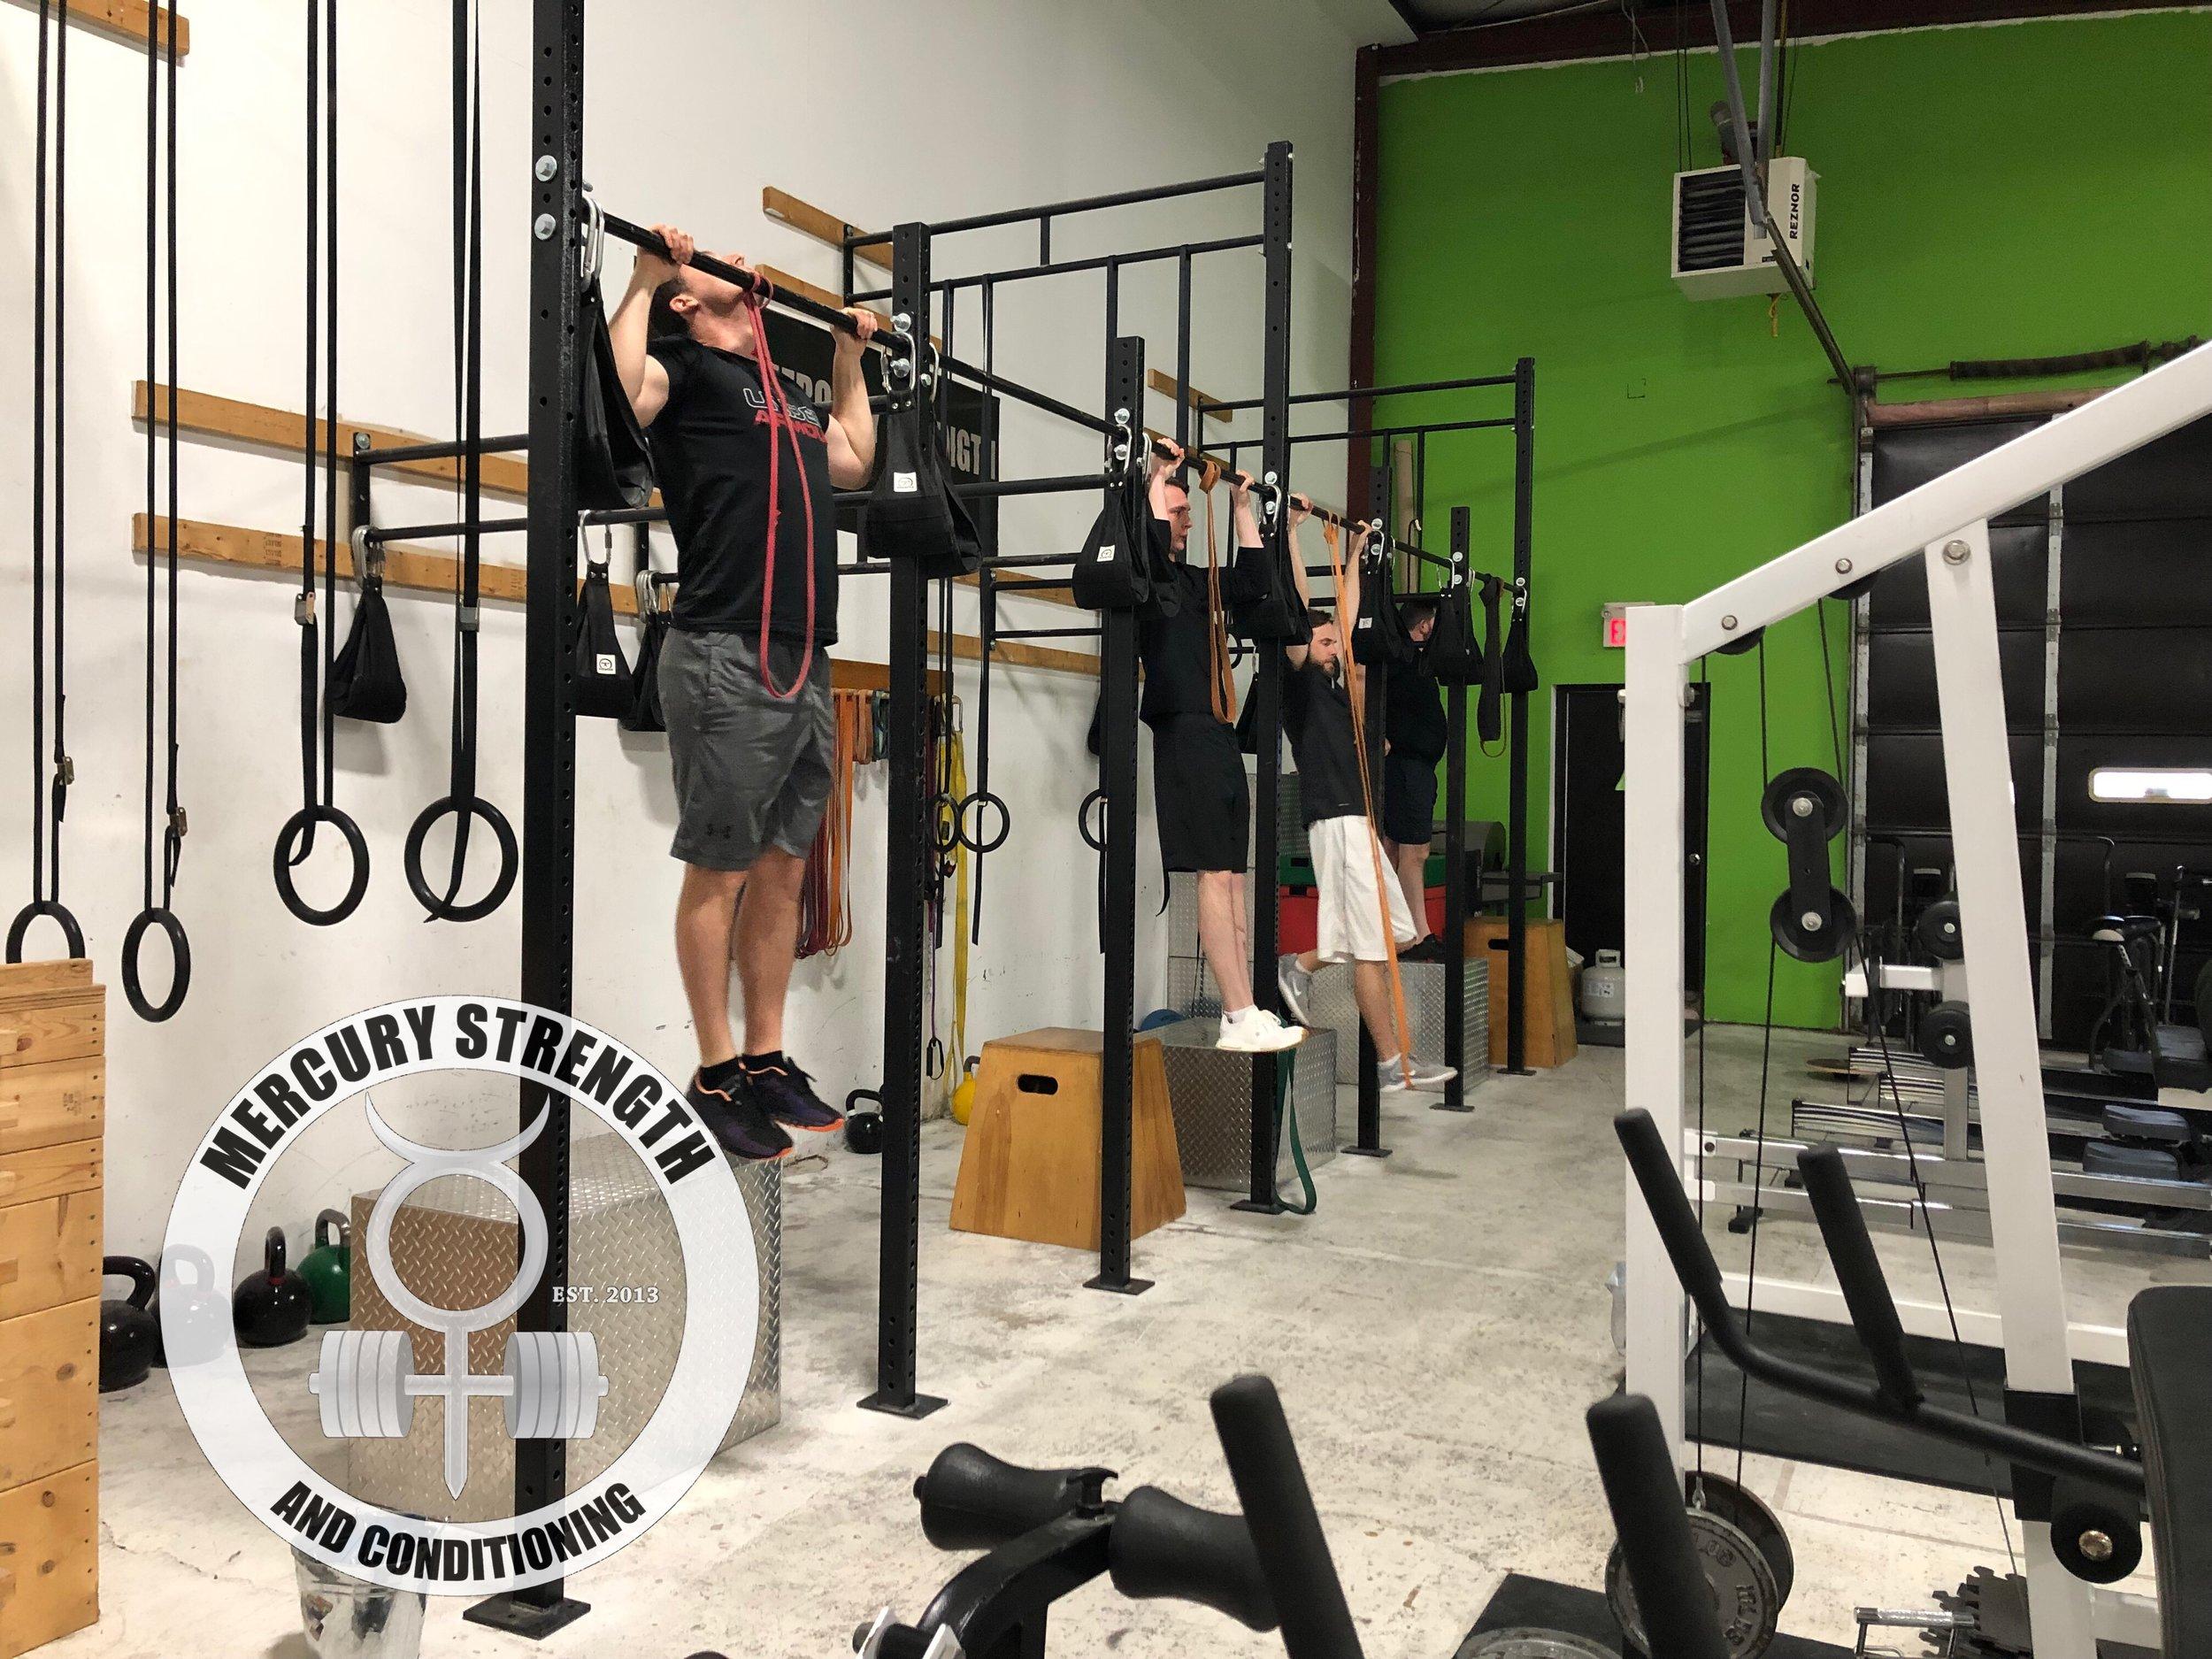 Gym-powerlifting-fitness-personal training-training-bootcamp-crossfit-kingston-kingston gym-kids-mercury-strength-conditioning-athlete-Pull-Up.JPG